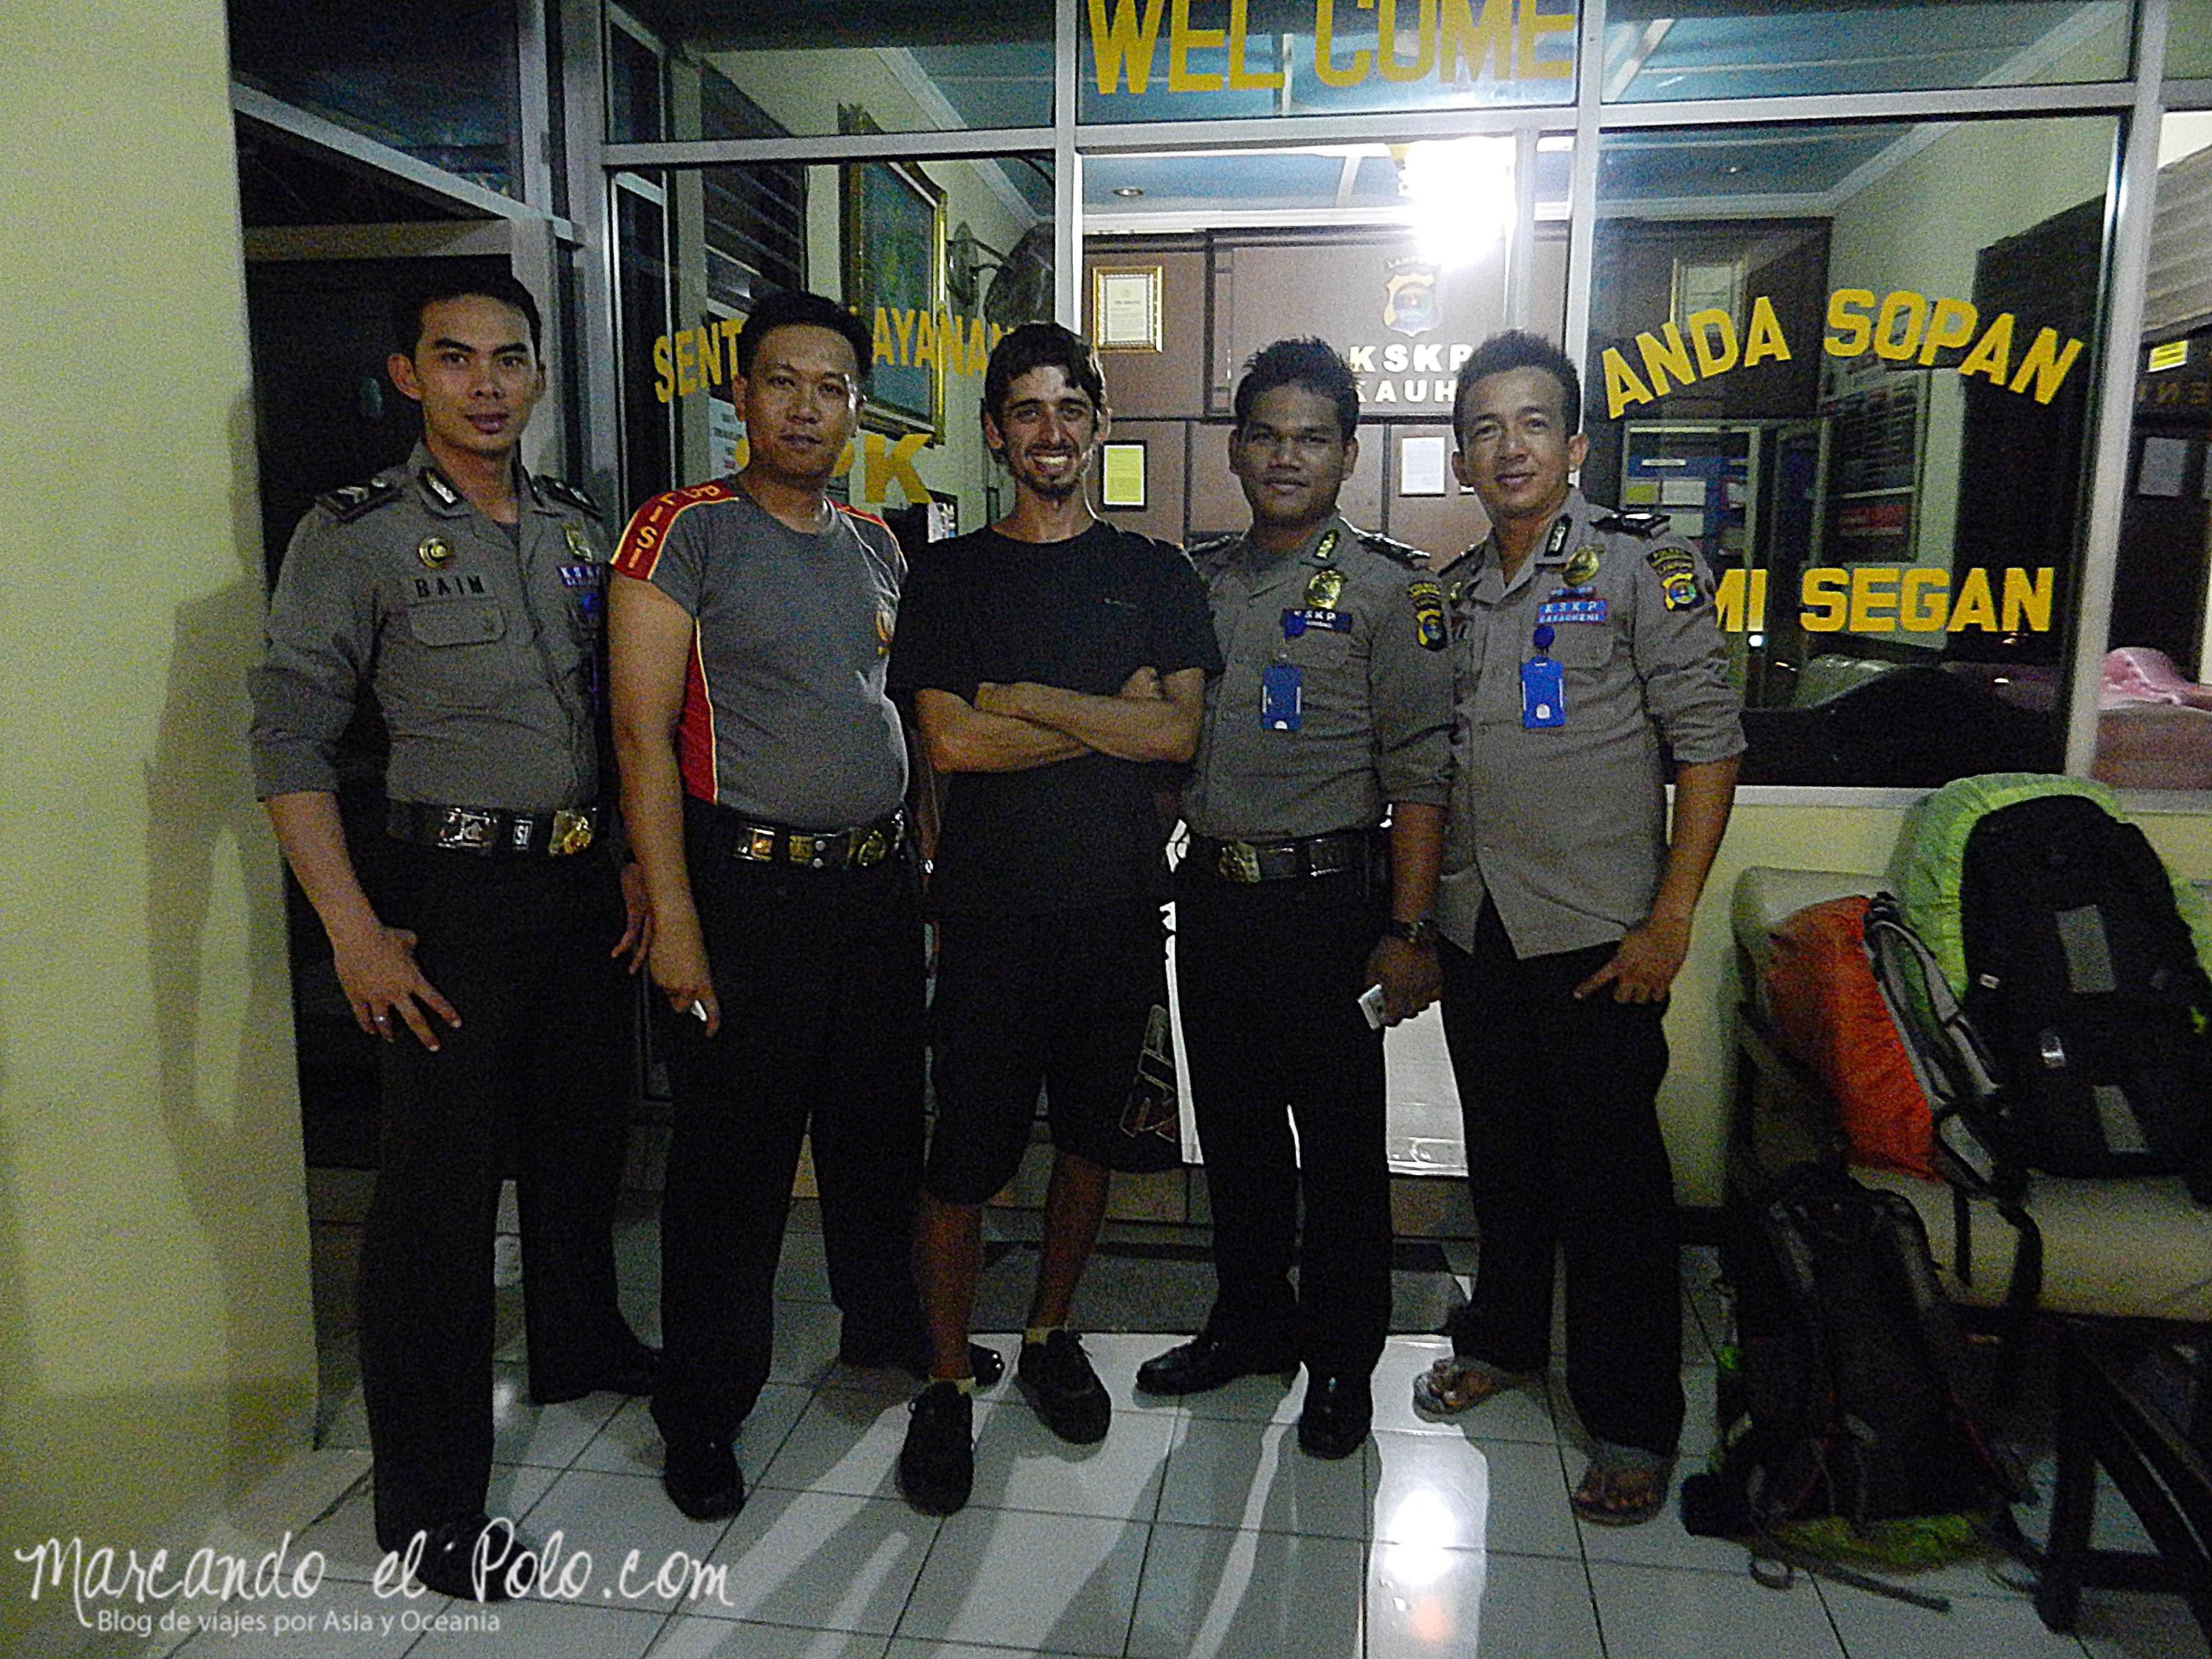 Viajar a Indonesia - policia